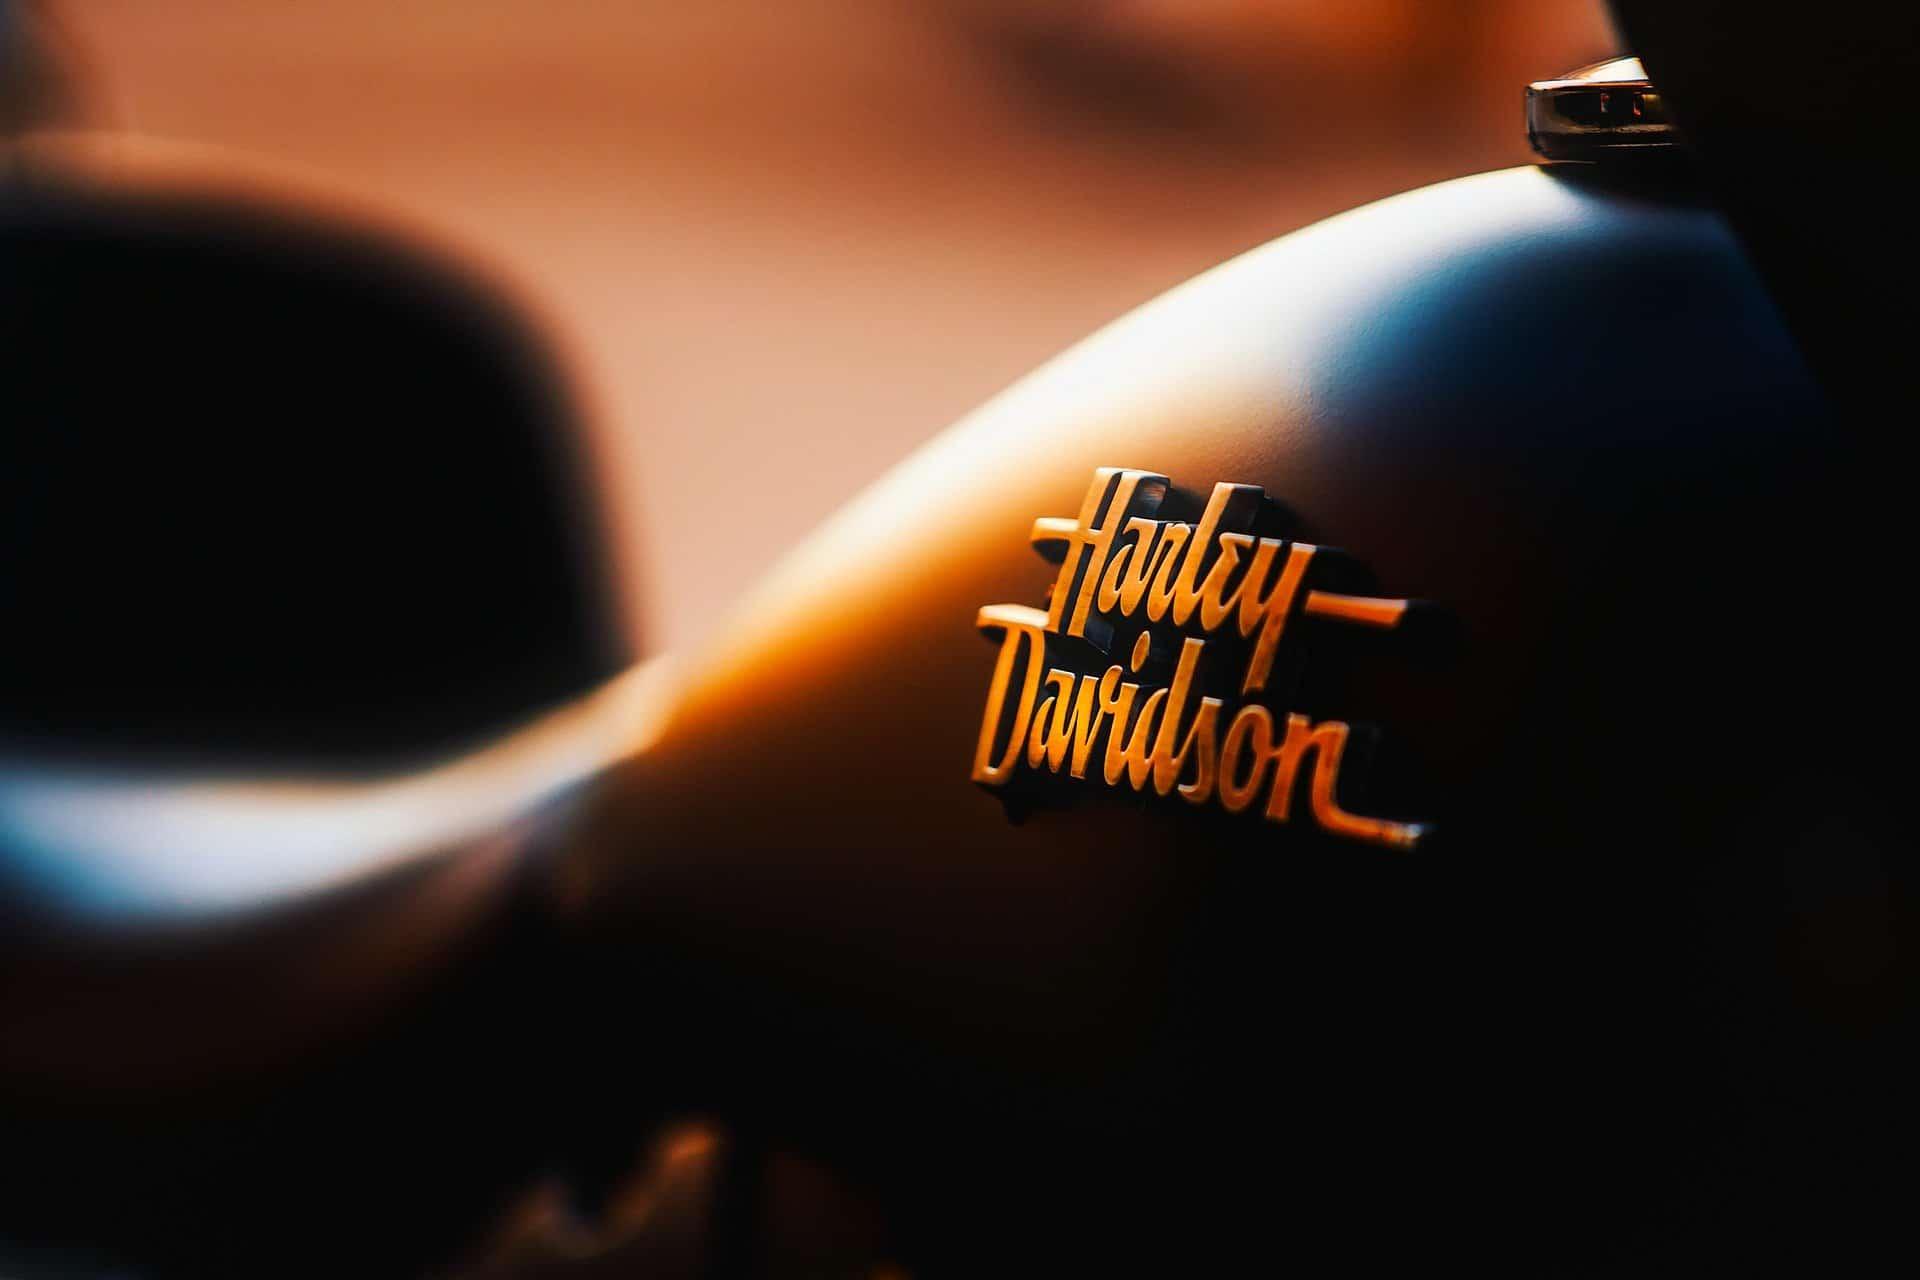 harley davidson logo close-up